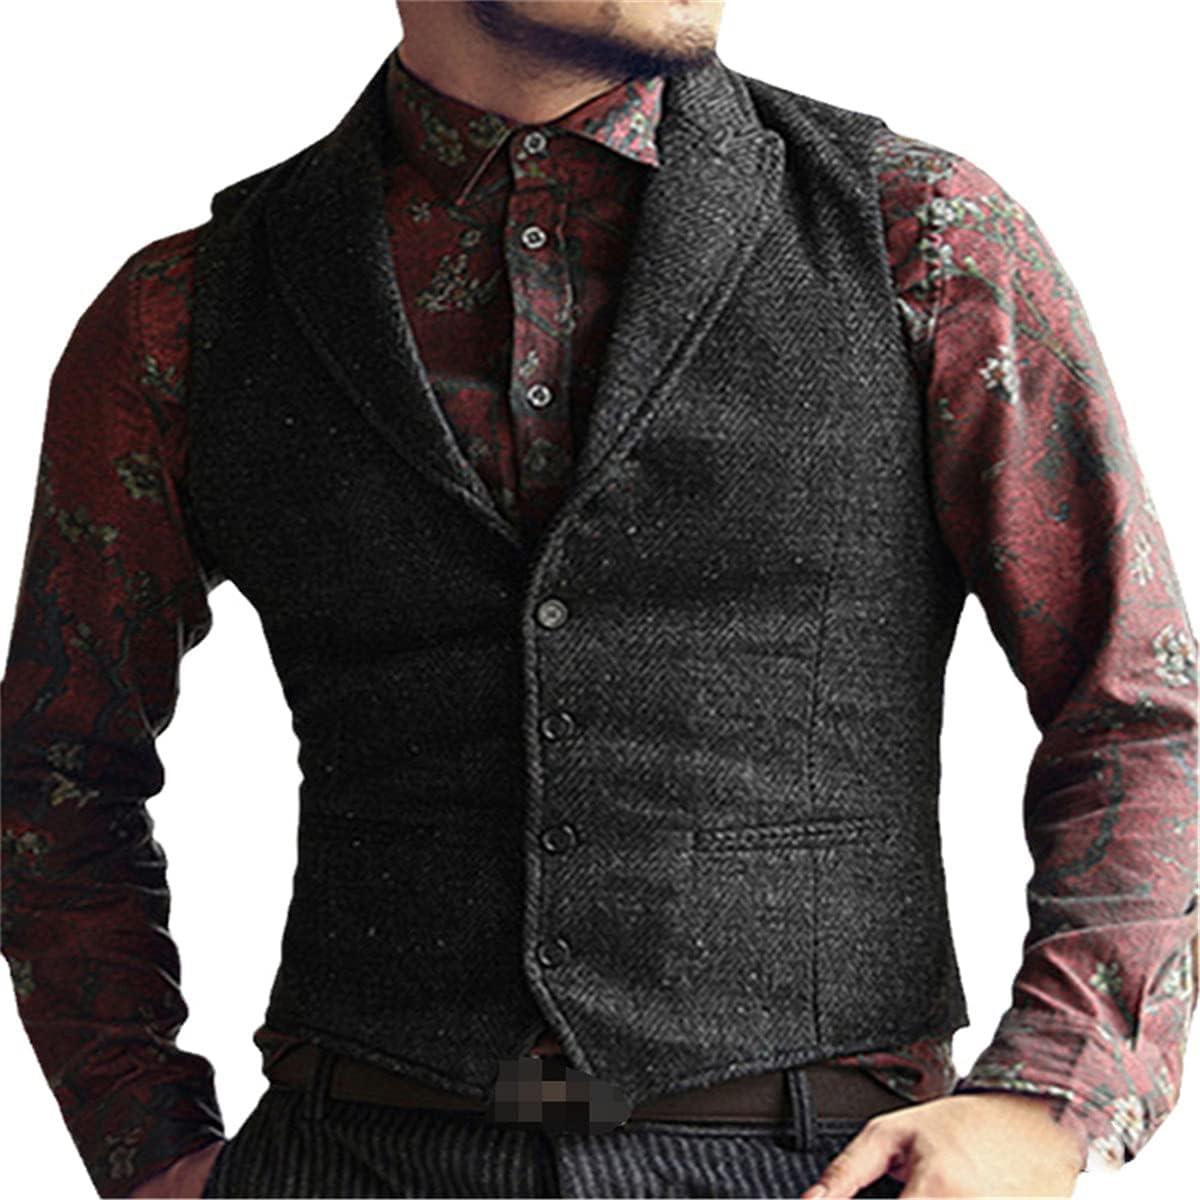 Men's Suit Vest V-neck Herringbone Formal Business Vest Slim Vest Vest Best Man Wedding Best Man